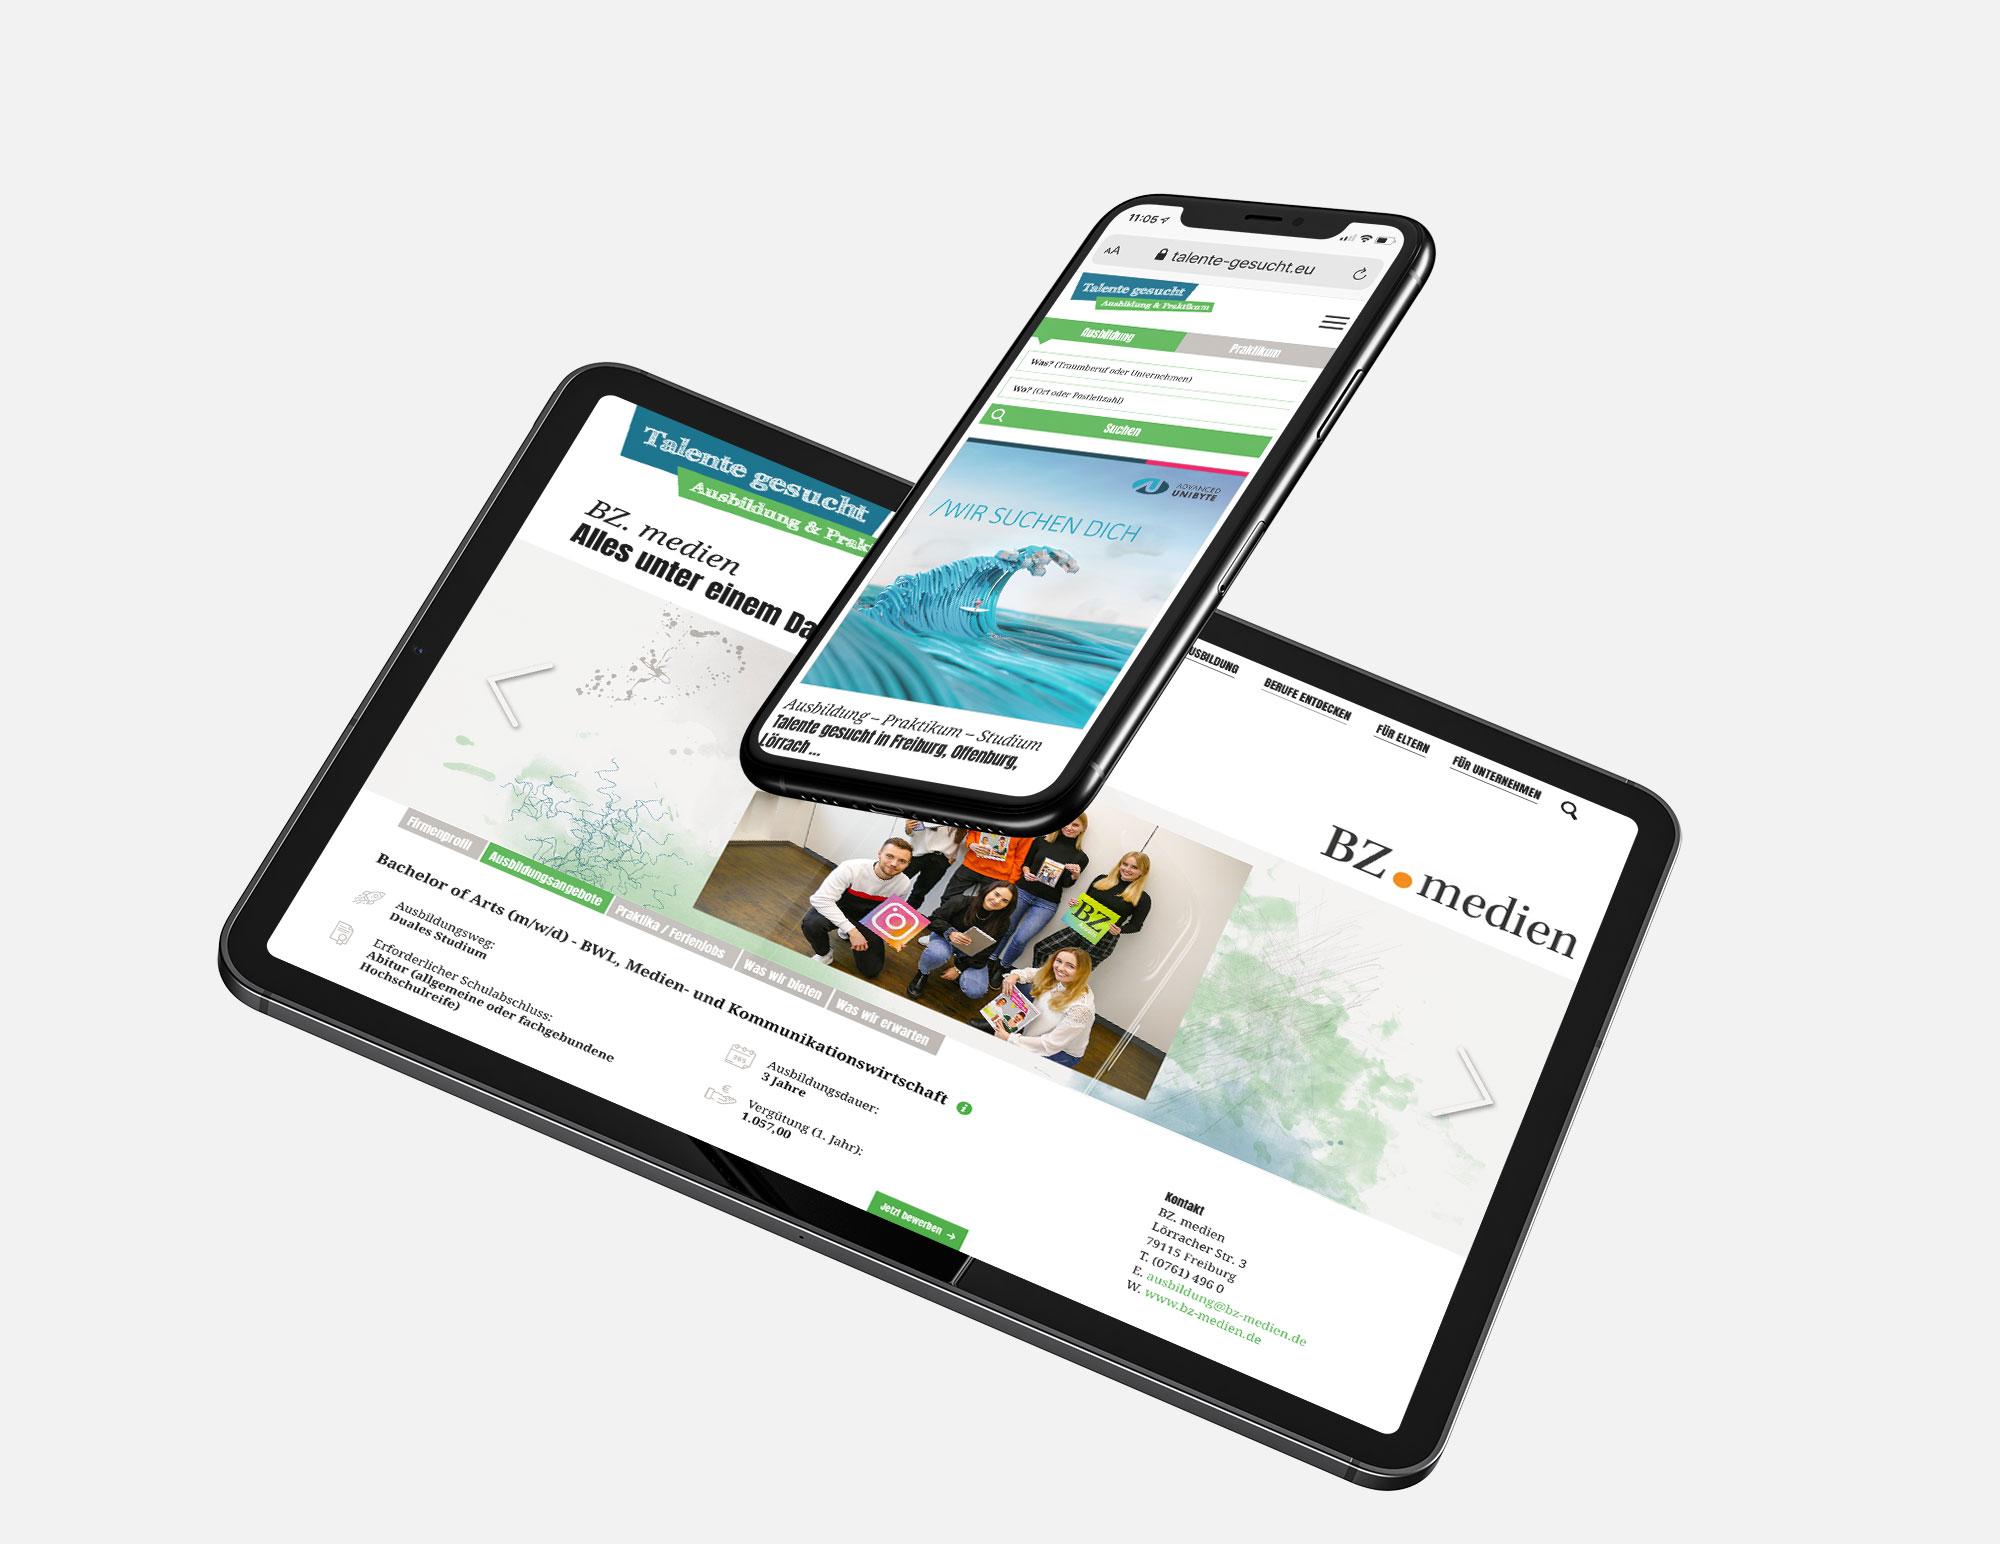 5_Talente-gesucht_Website_iPad_iPhone_Web_Neu